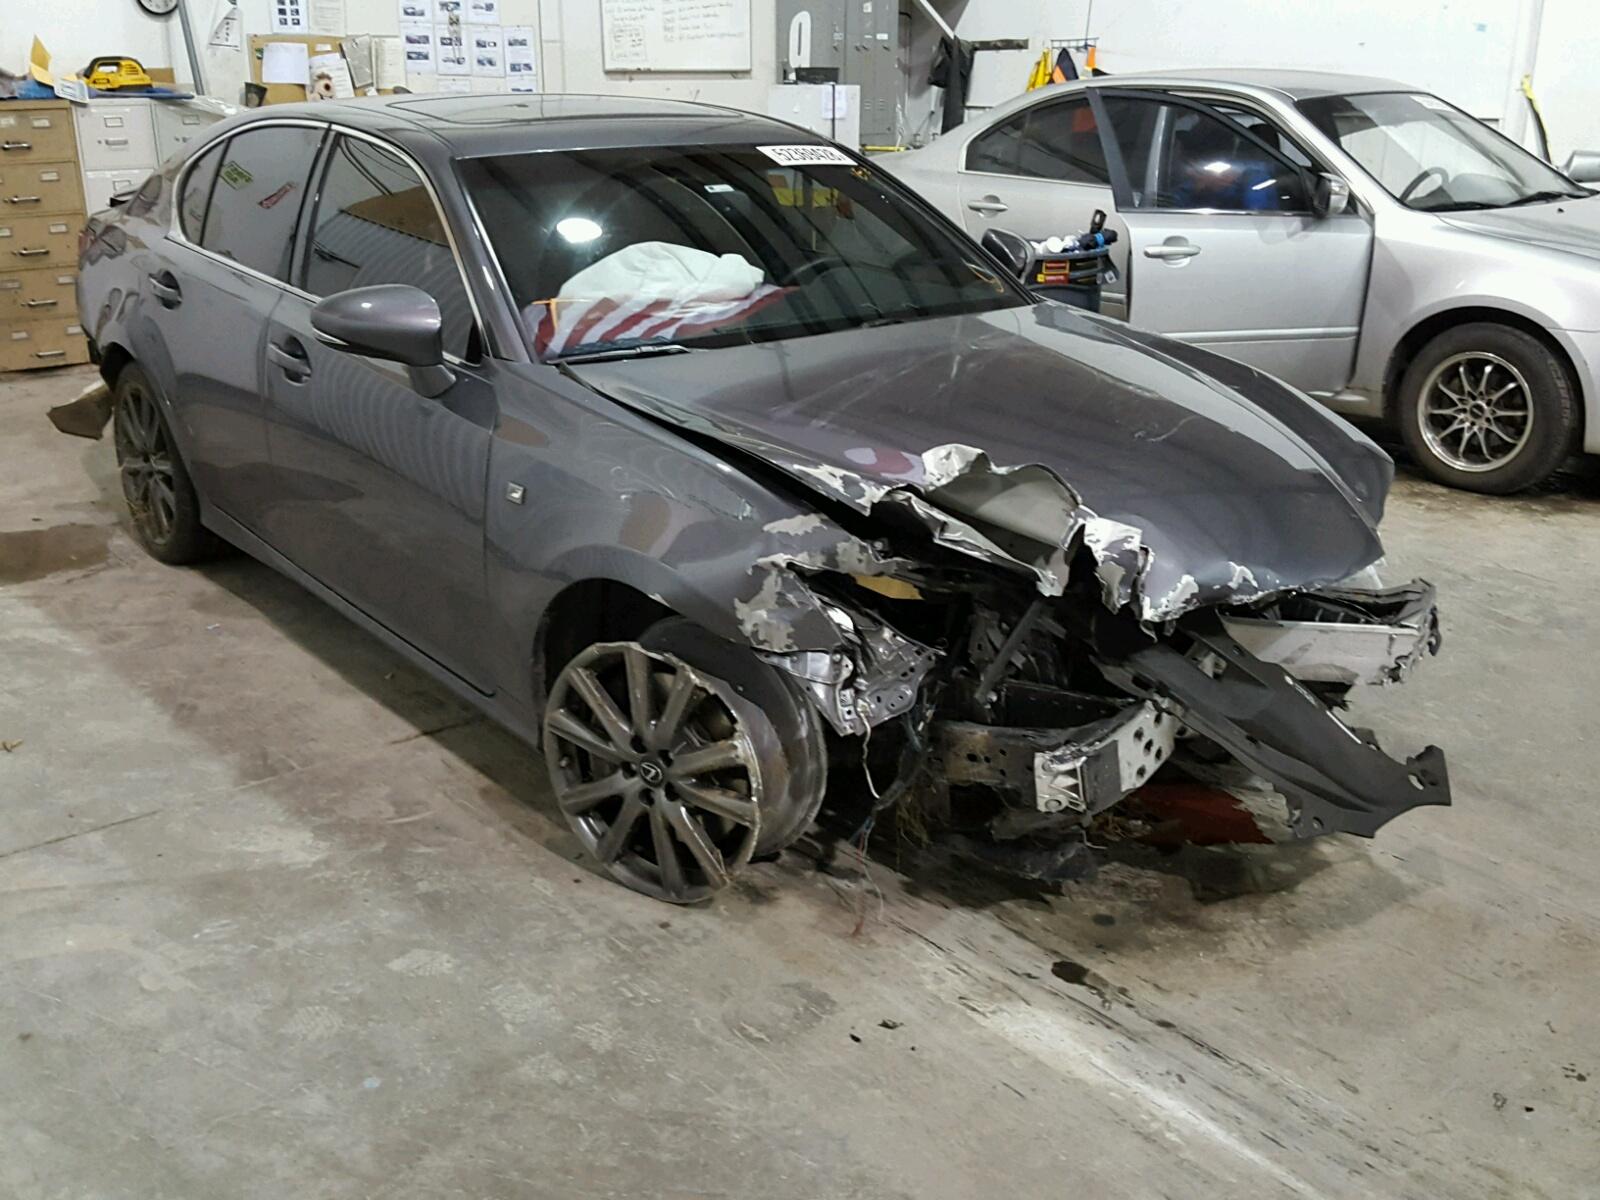 Repairable Vs. Nonrepairable Title Salvage Car